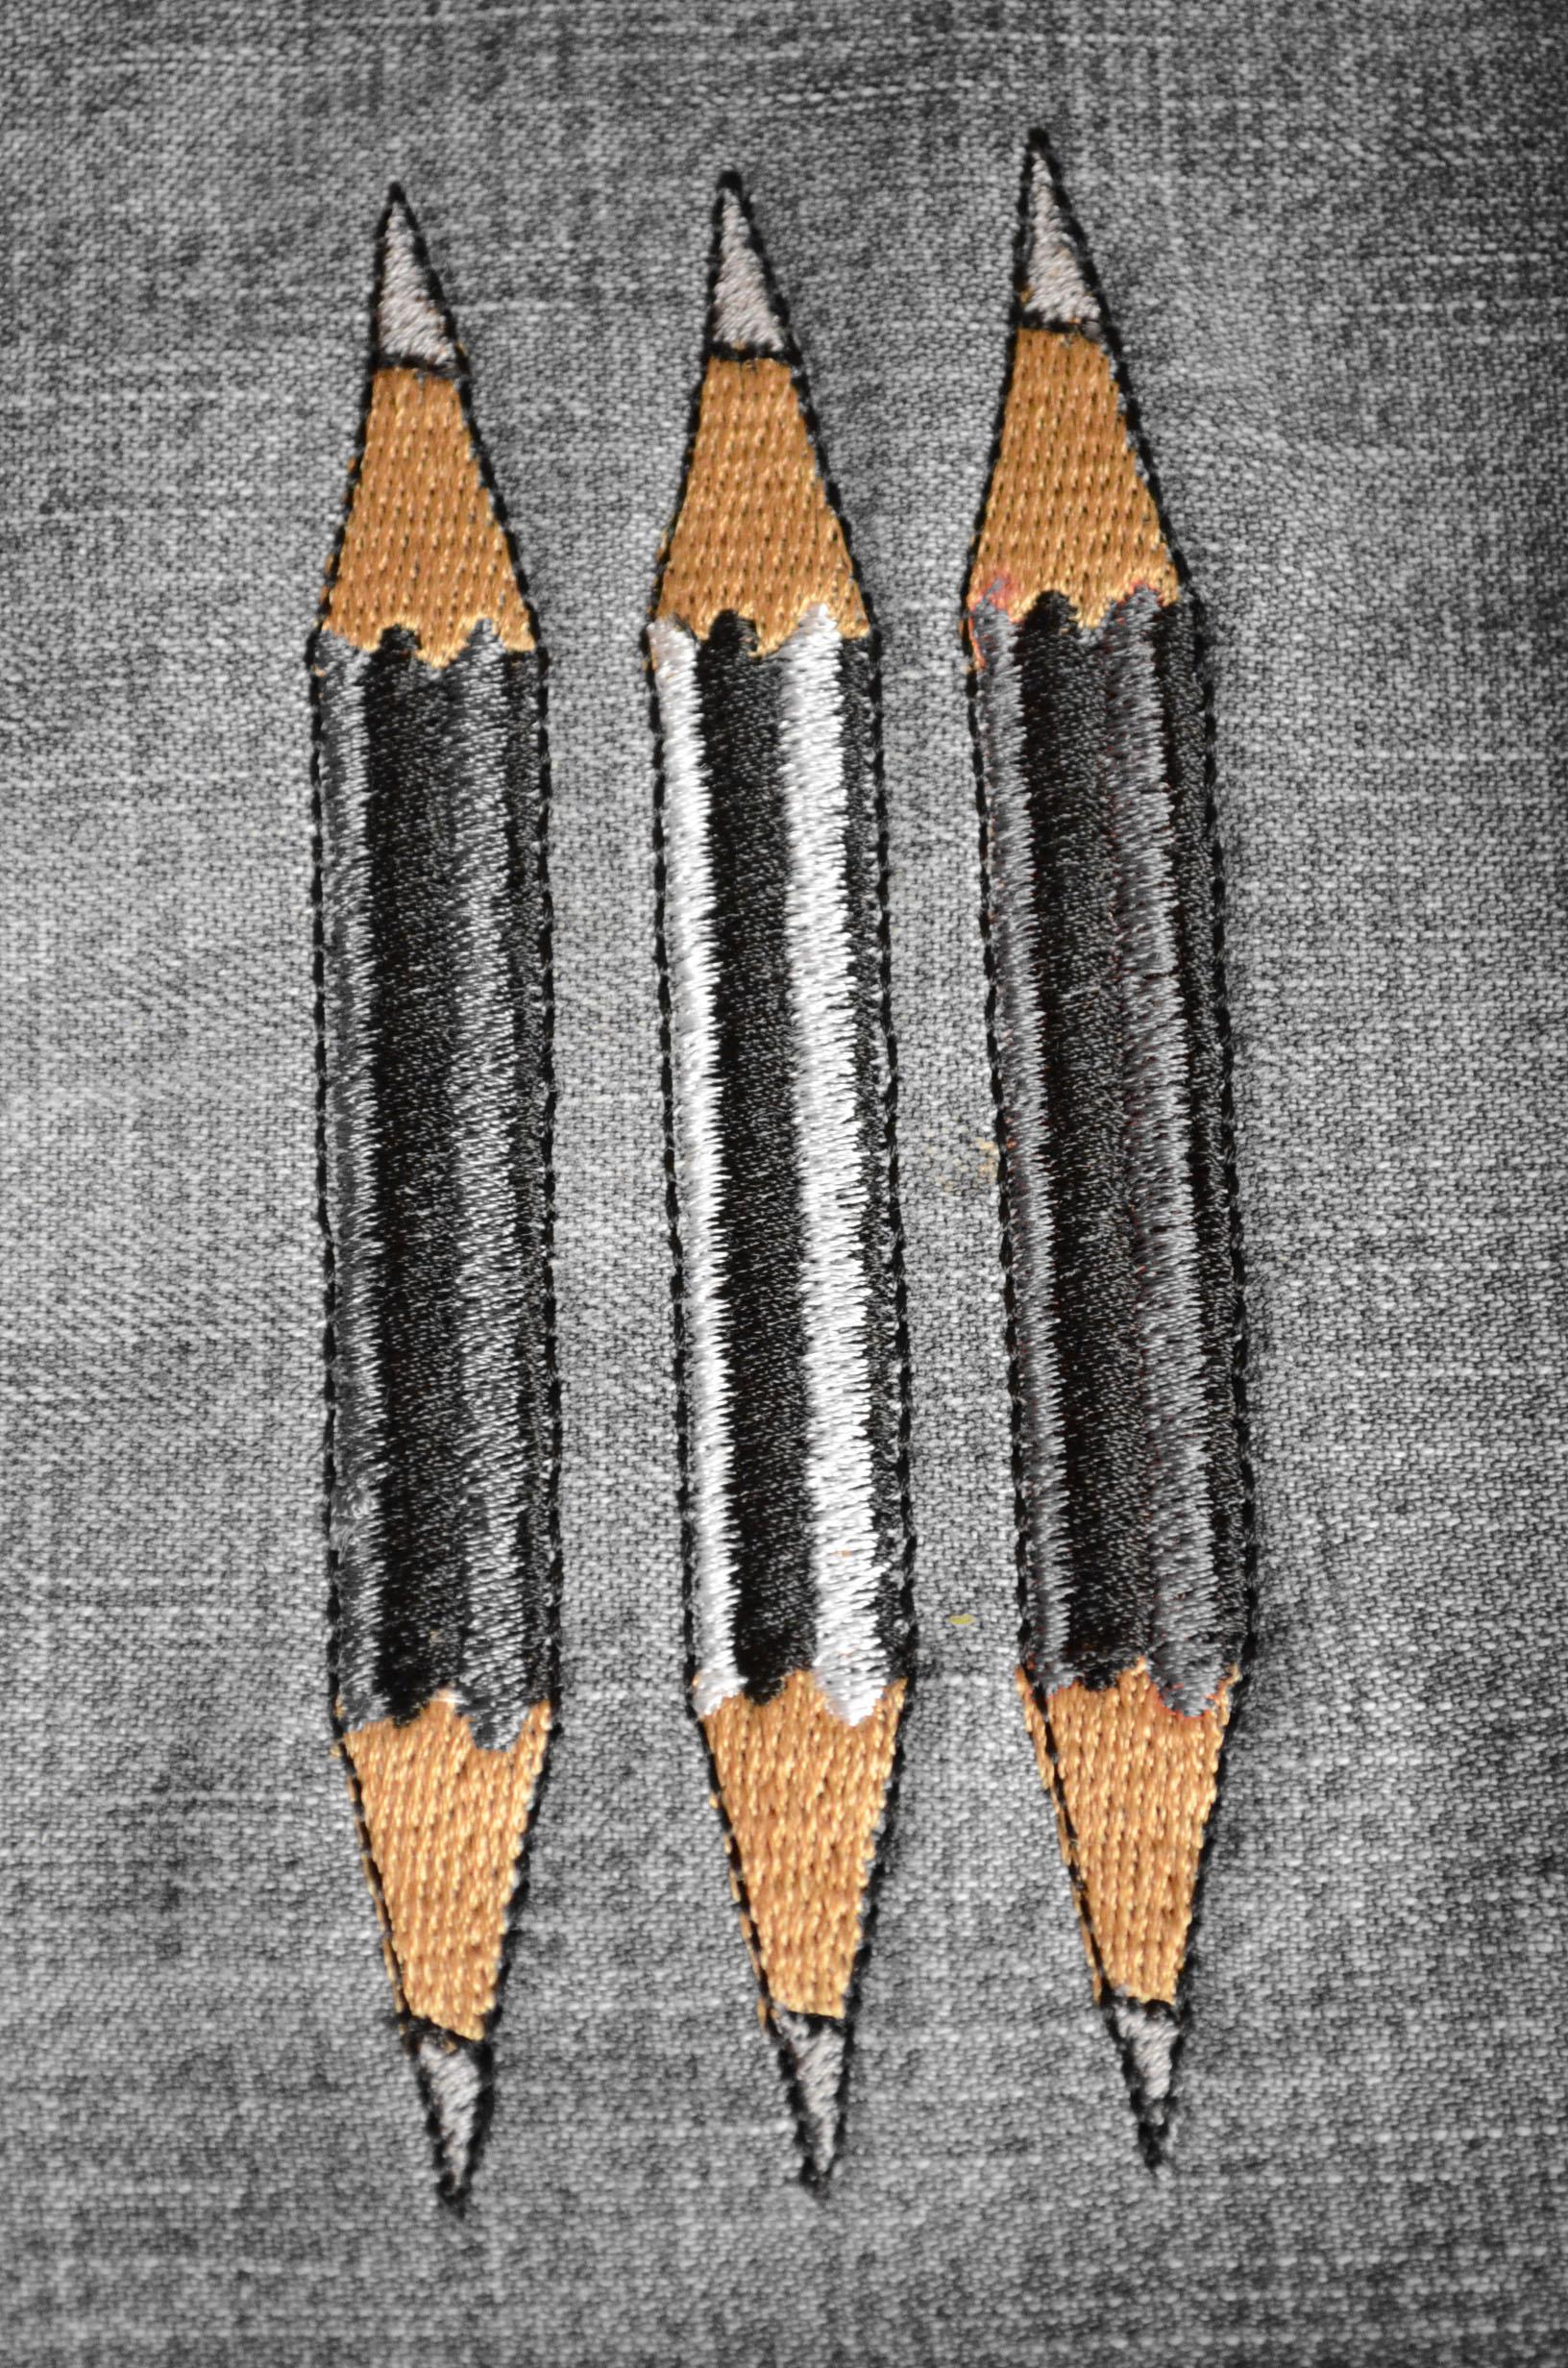 roetsch Stickdatei-Freebie-drei-Bleistifte-selektive-Farbe-braun-beige